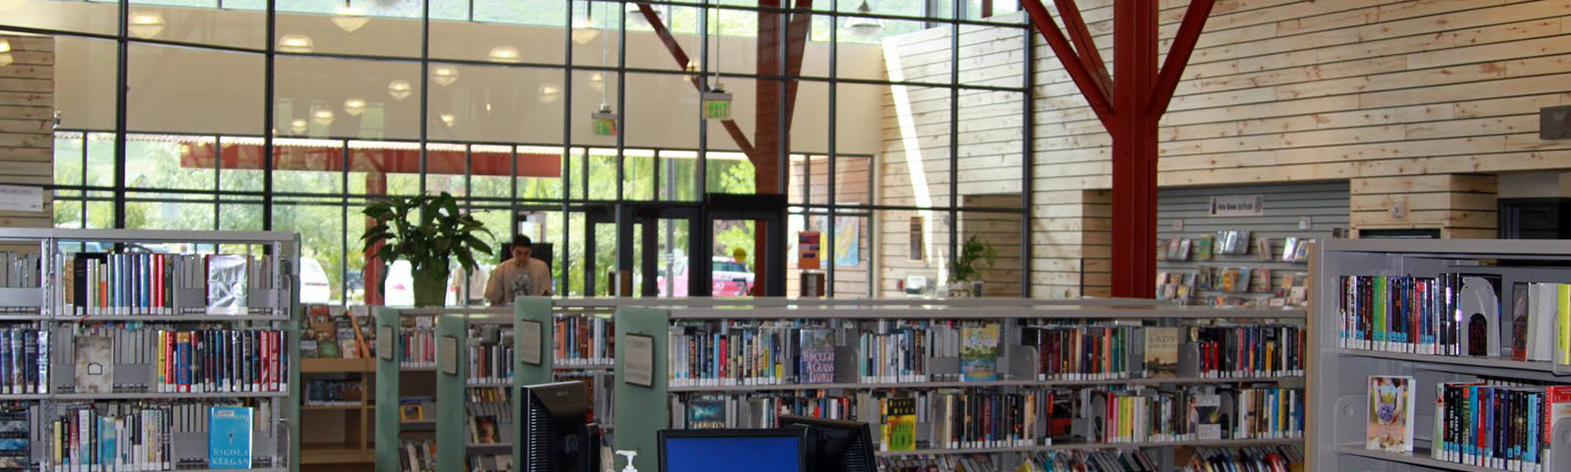 Basalt Library